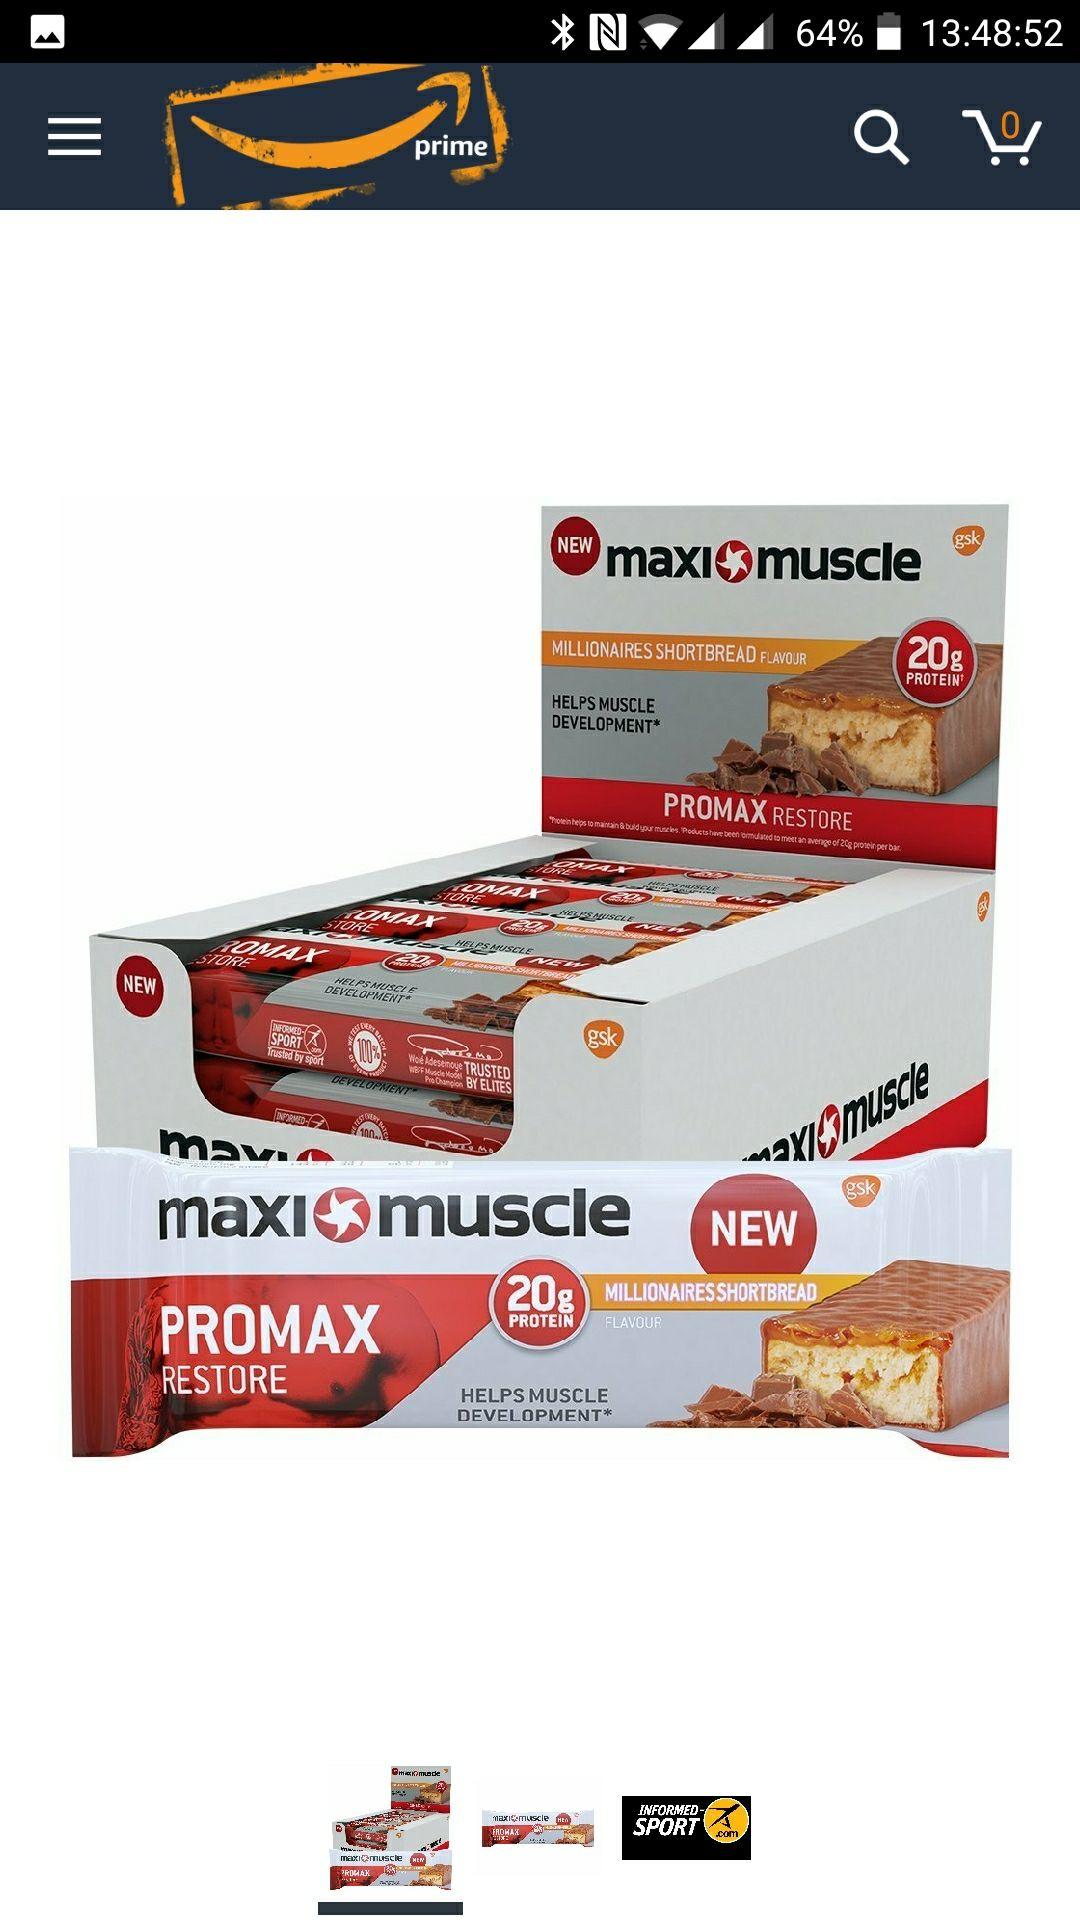 Maxi Muscle Millionaires Shortbread Bars. 12 x 60g - £13.49 (Prime / £18.24 non Prime) @ Amazon